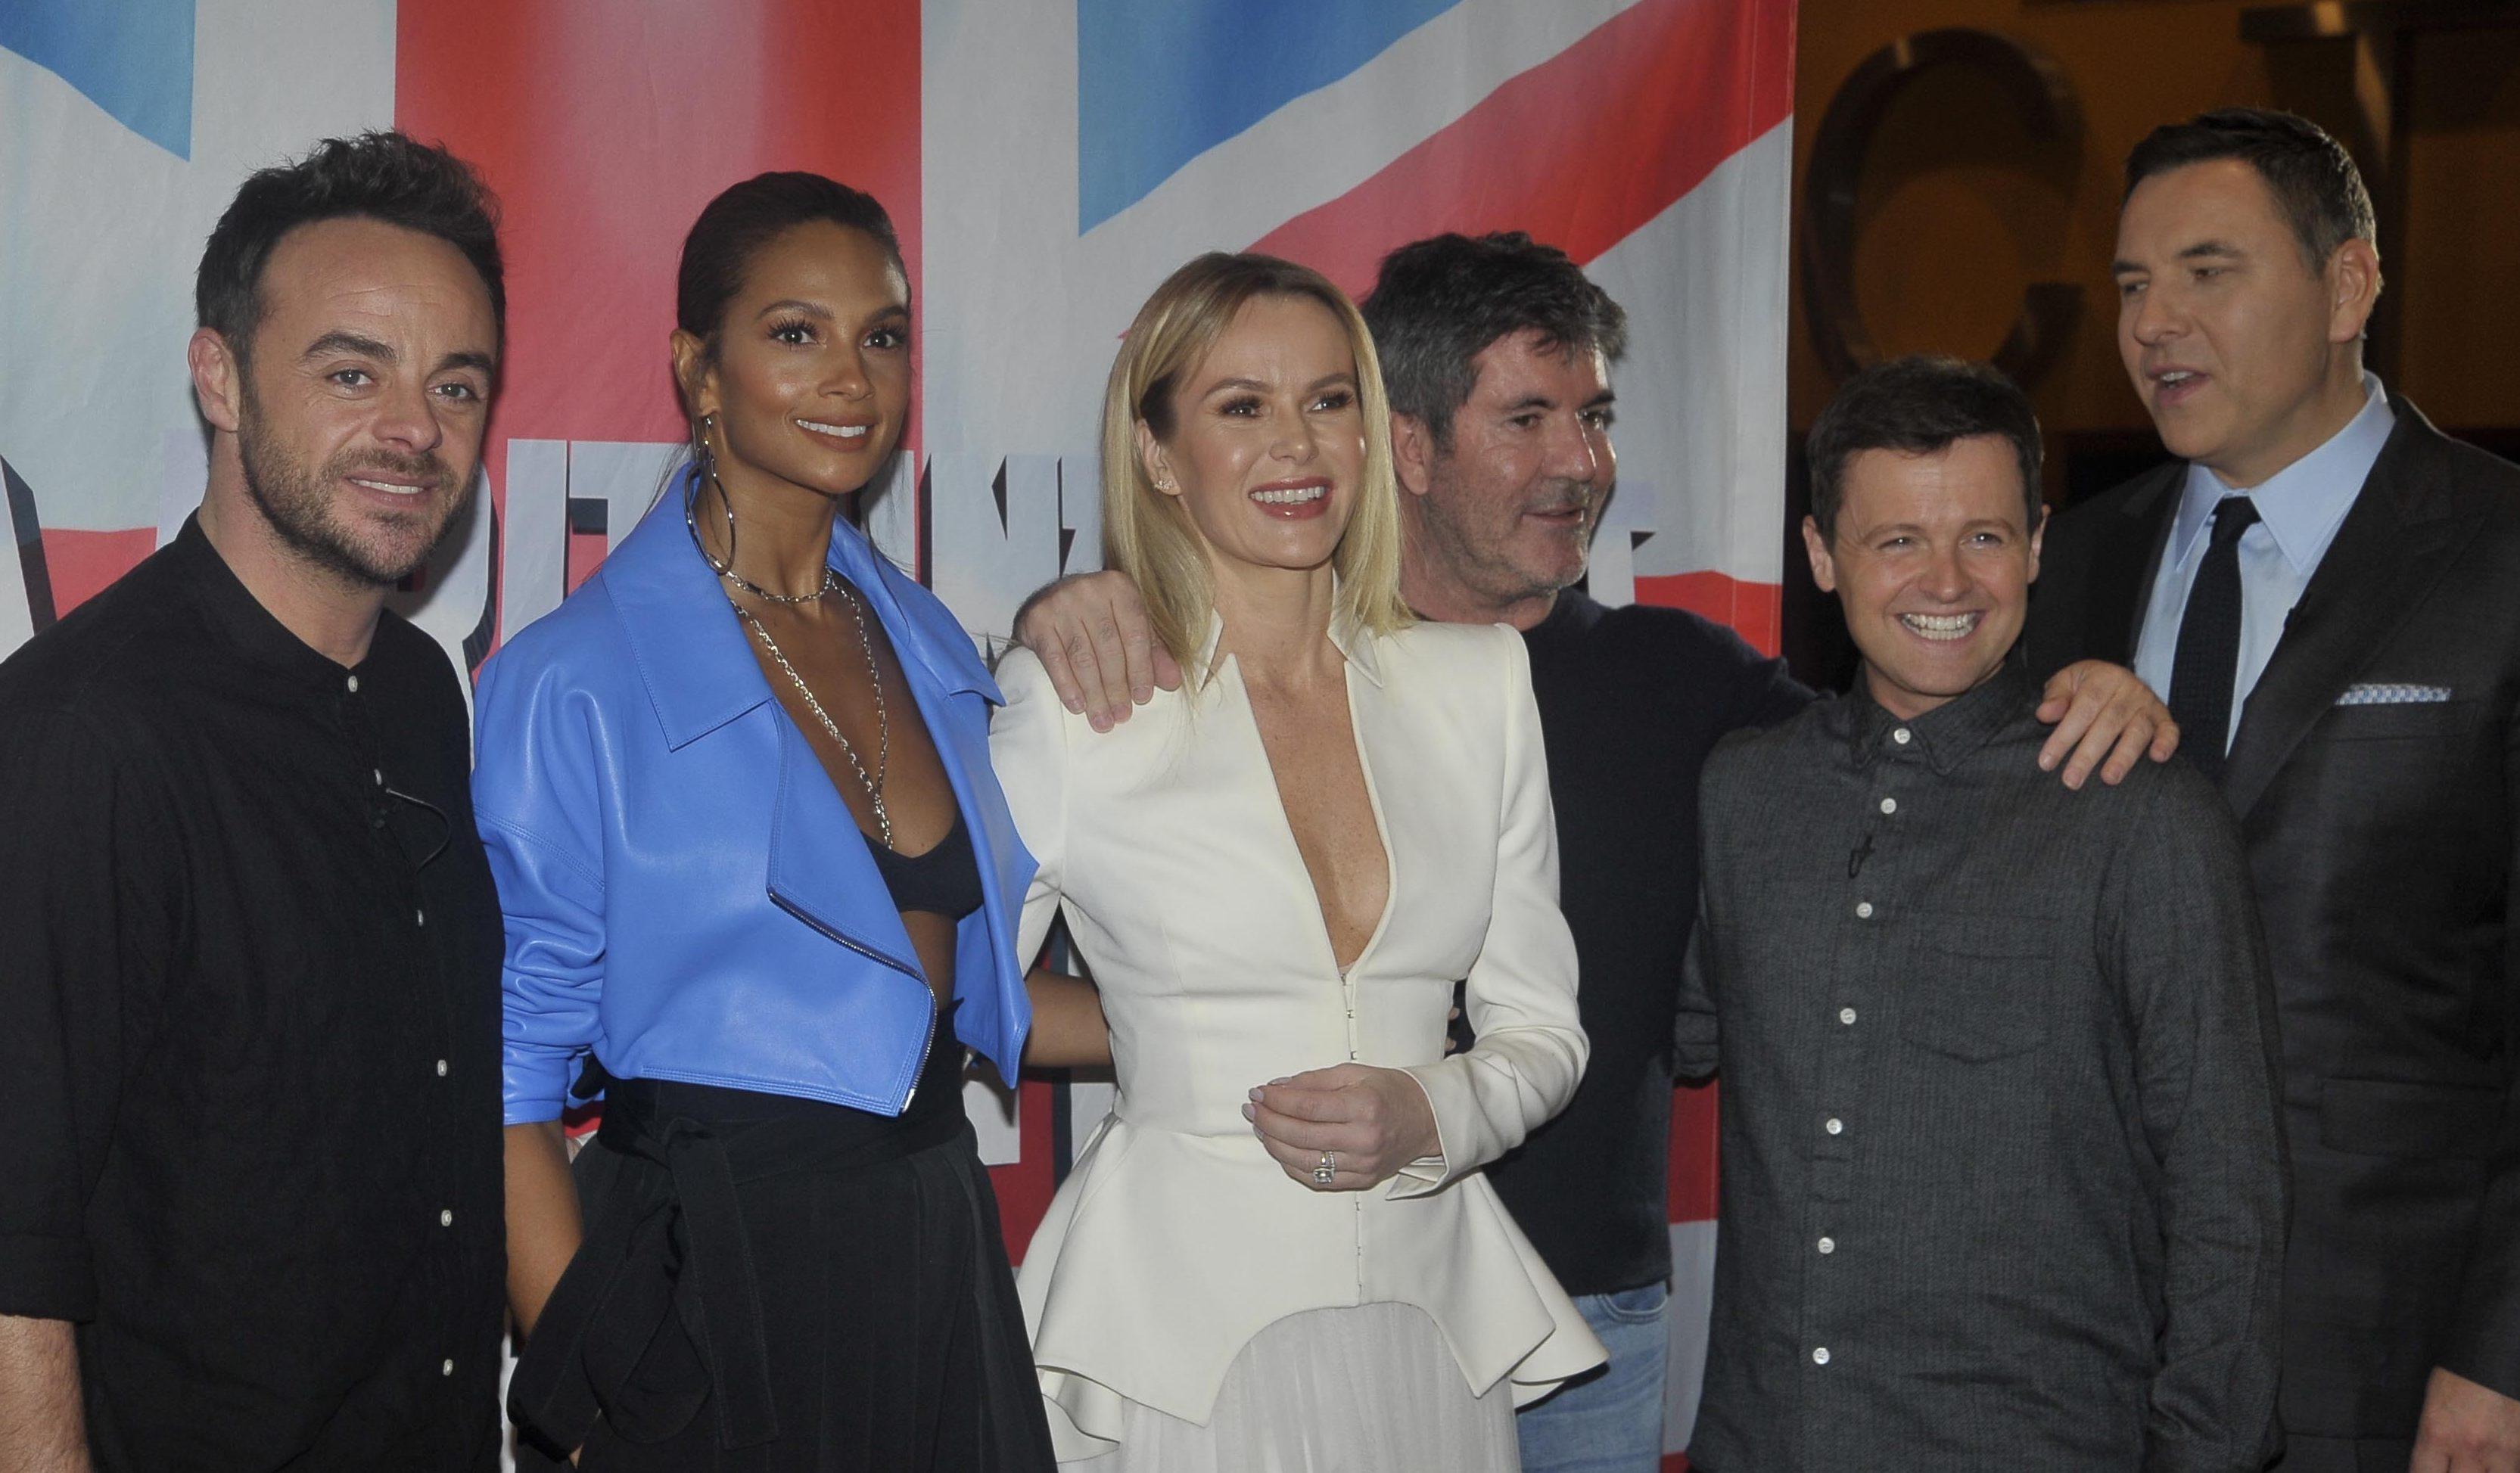 Amanda Holden on her Britain's Got Talent future